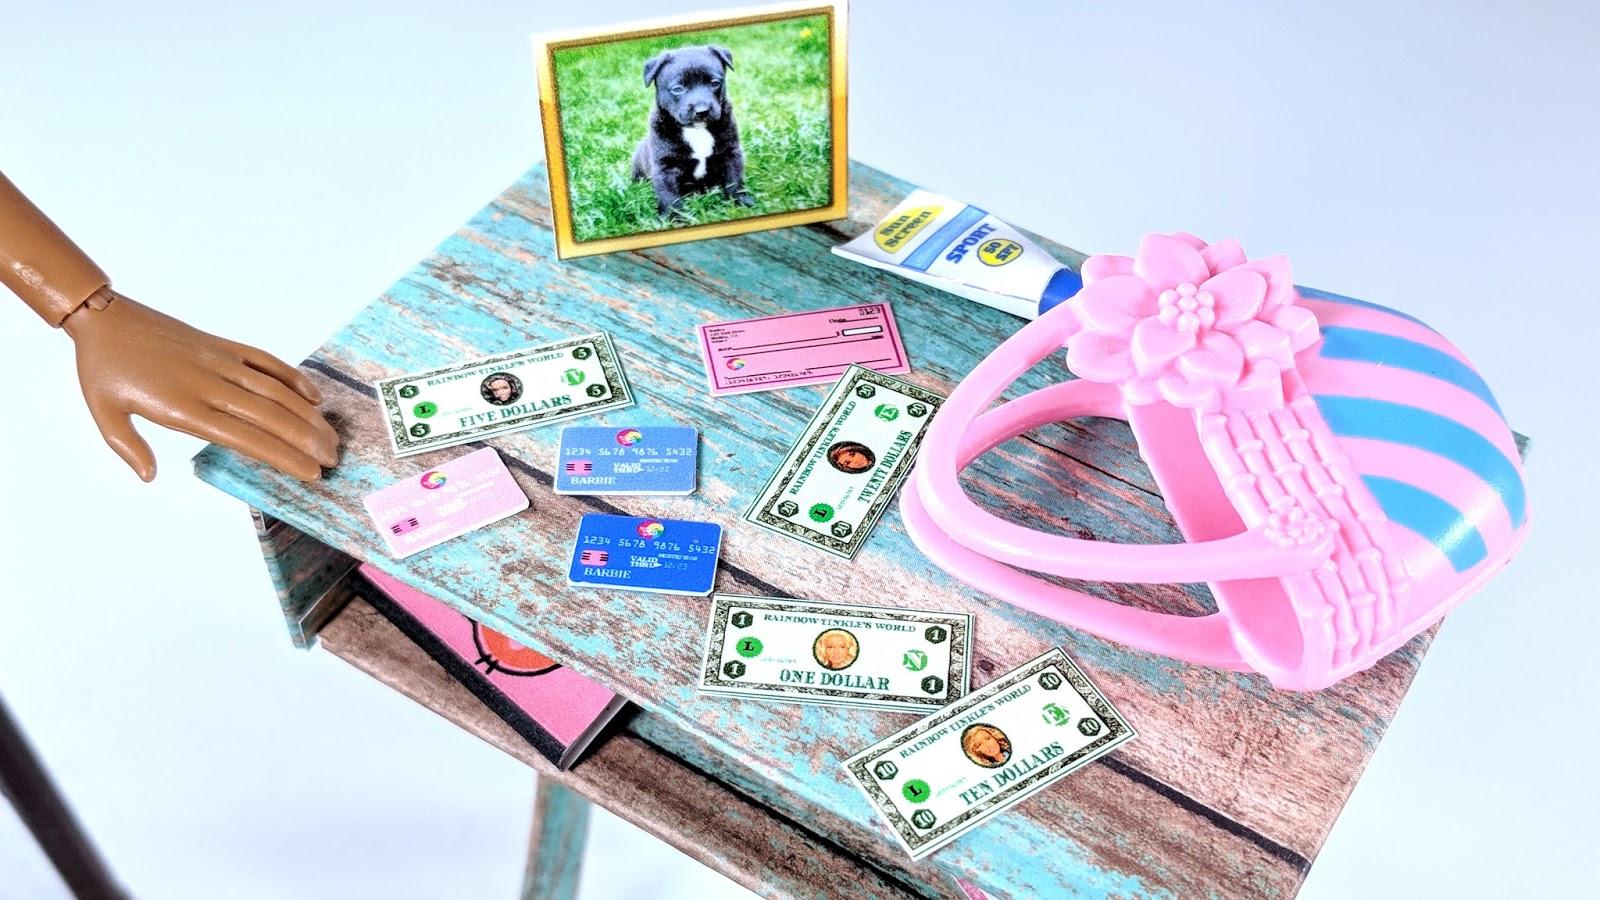 Rainbow Tinkle S World Get That Money Diy Miniature Barbie Doll Printable Cash Checks